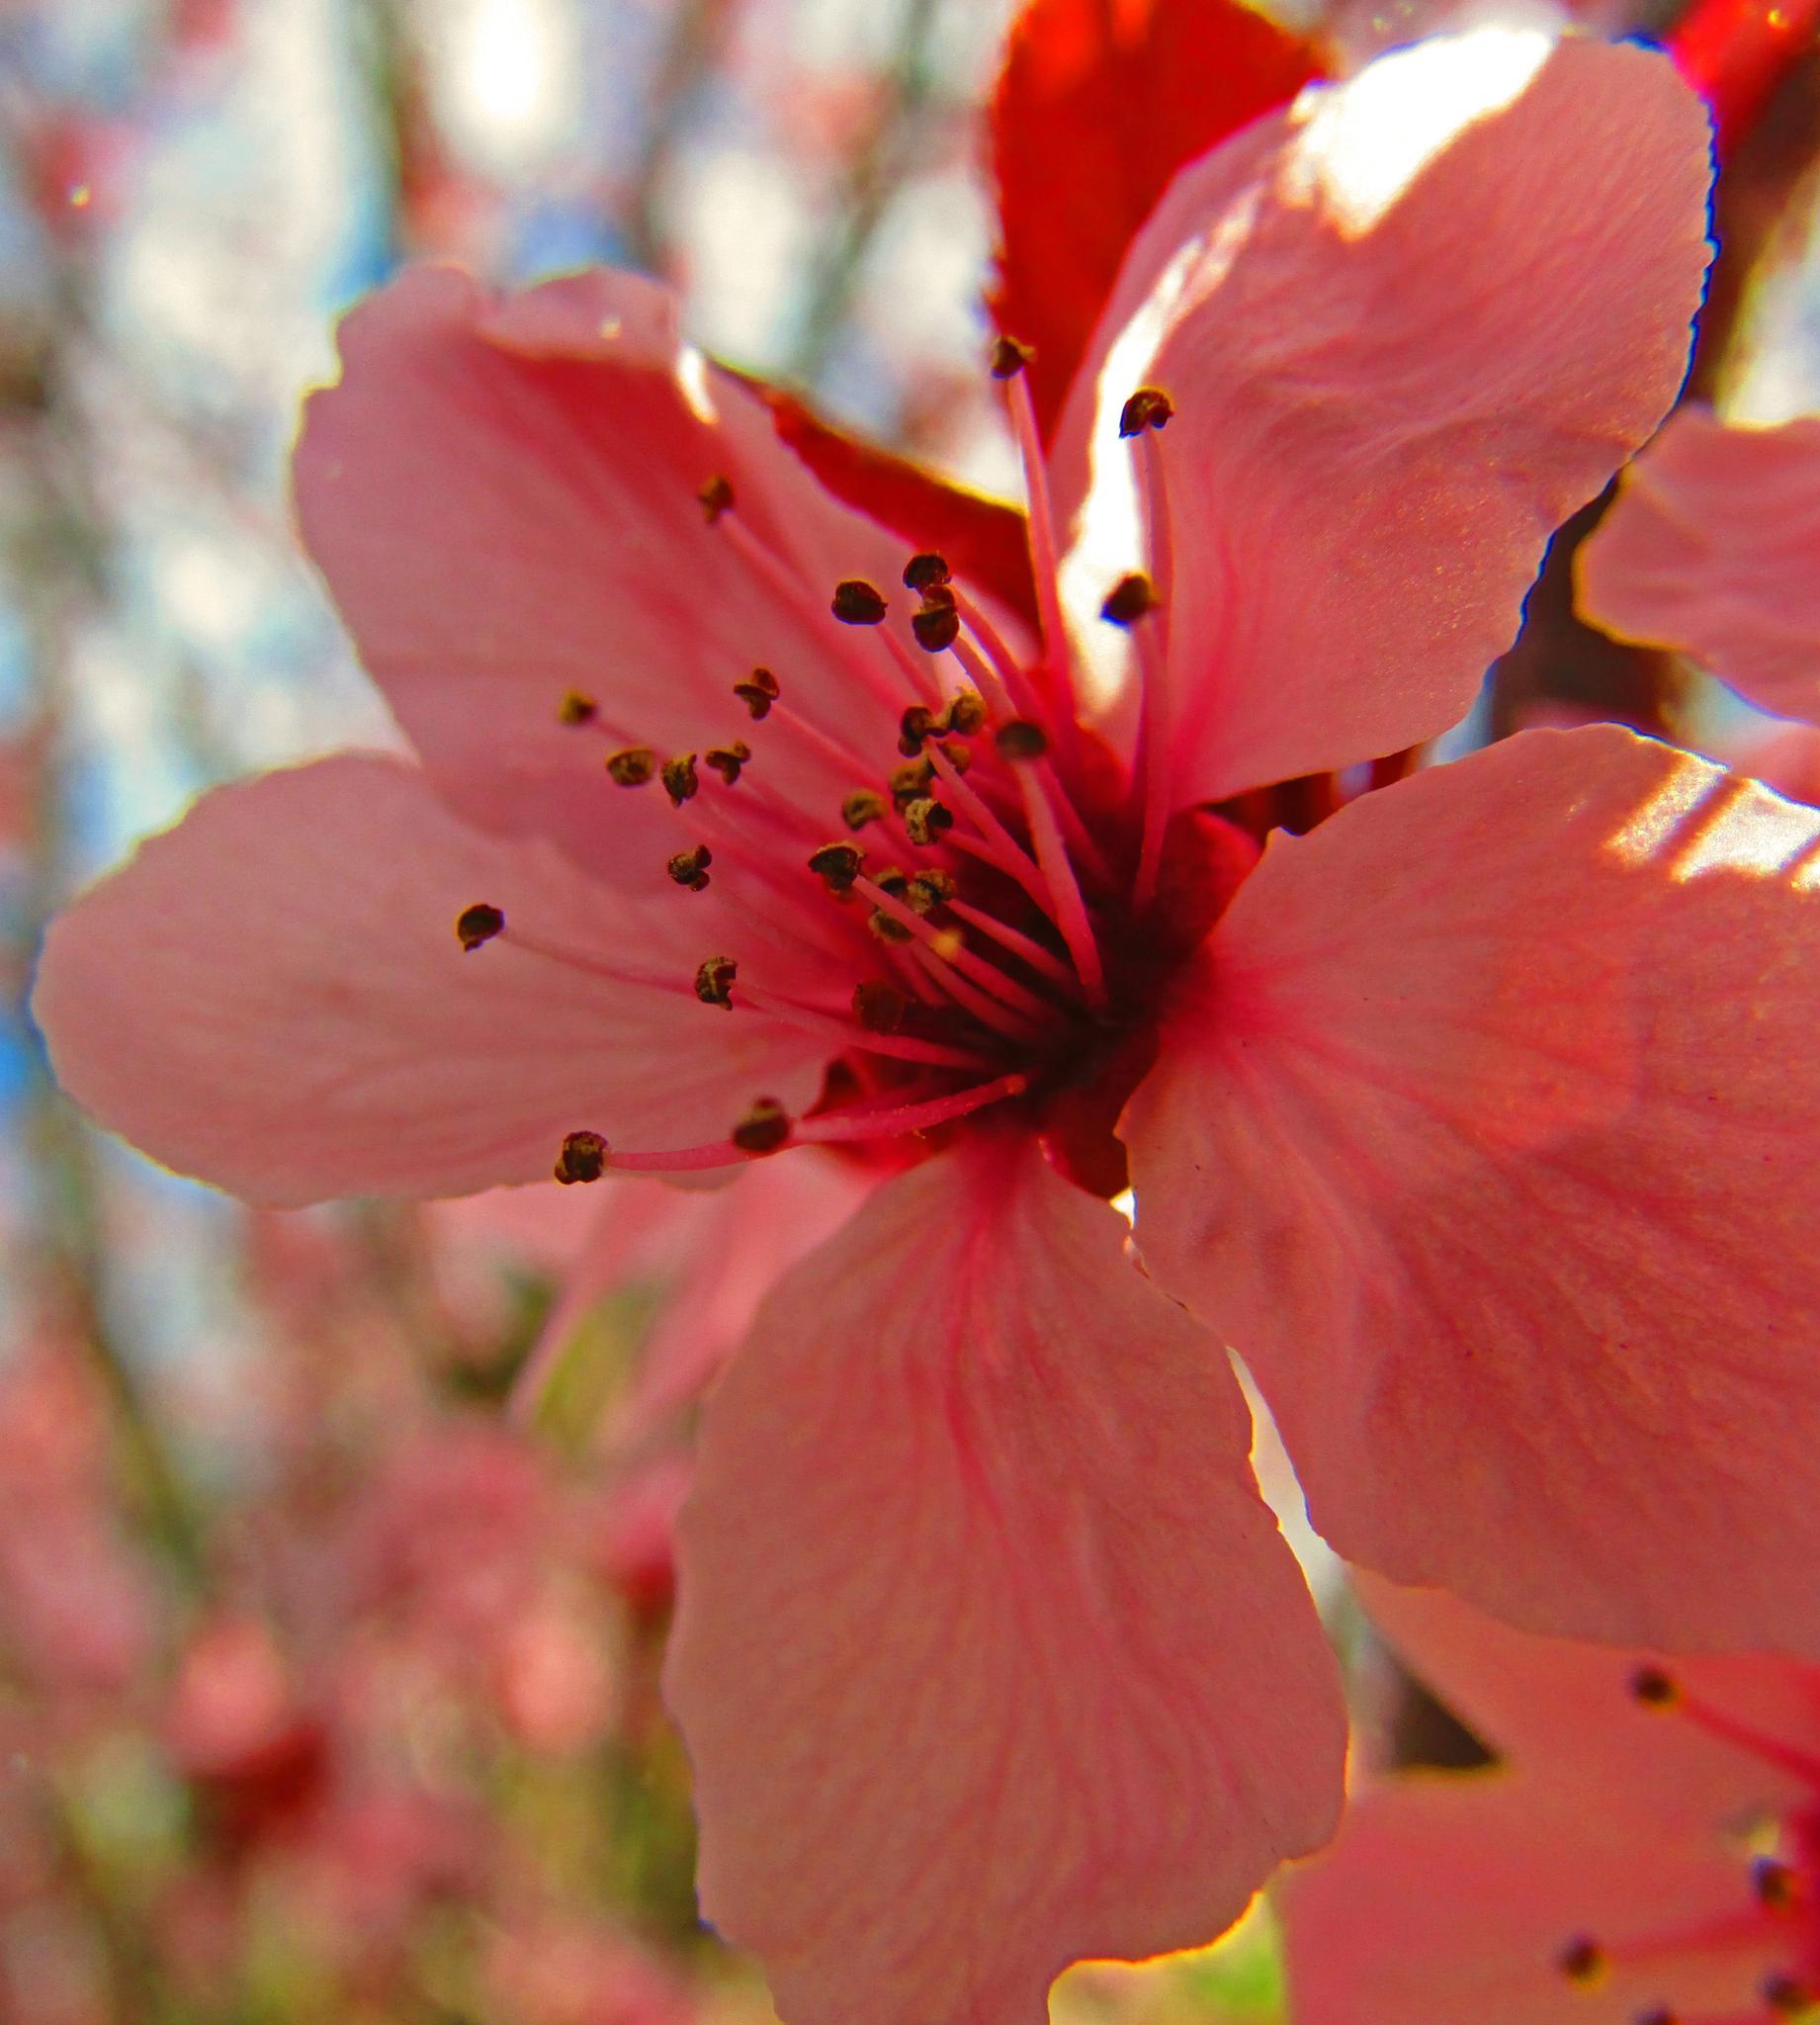 Wild Cherry Flower by Cina De Moura